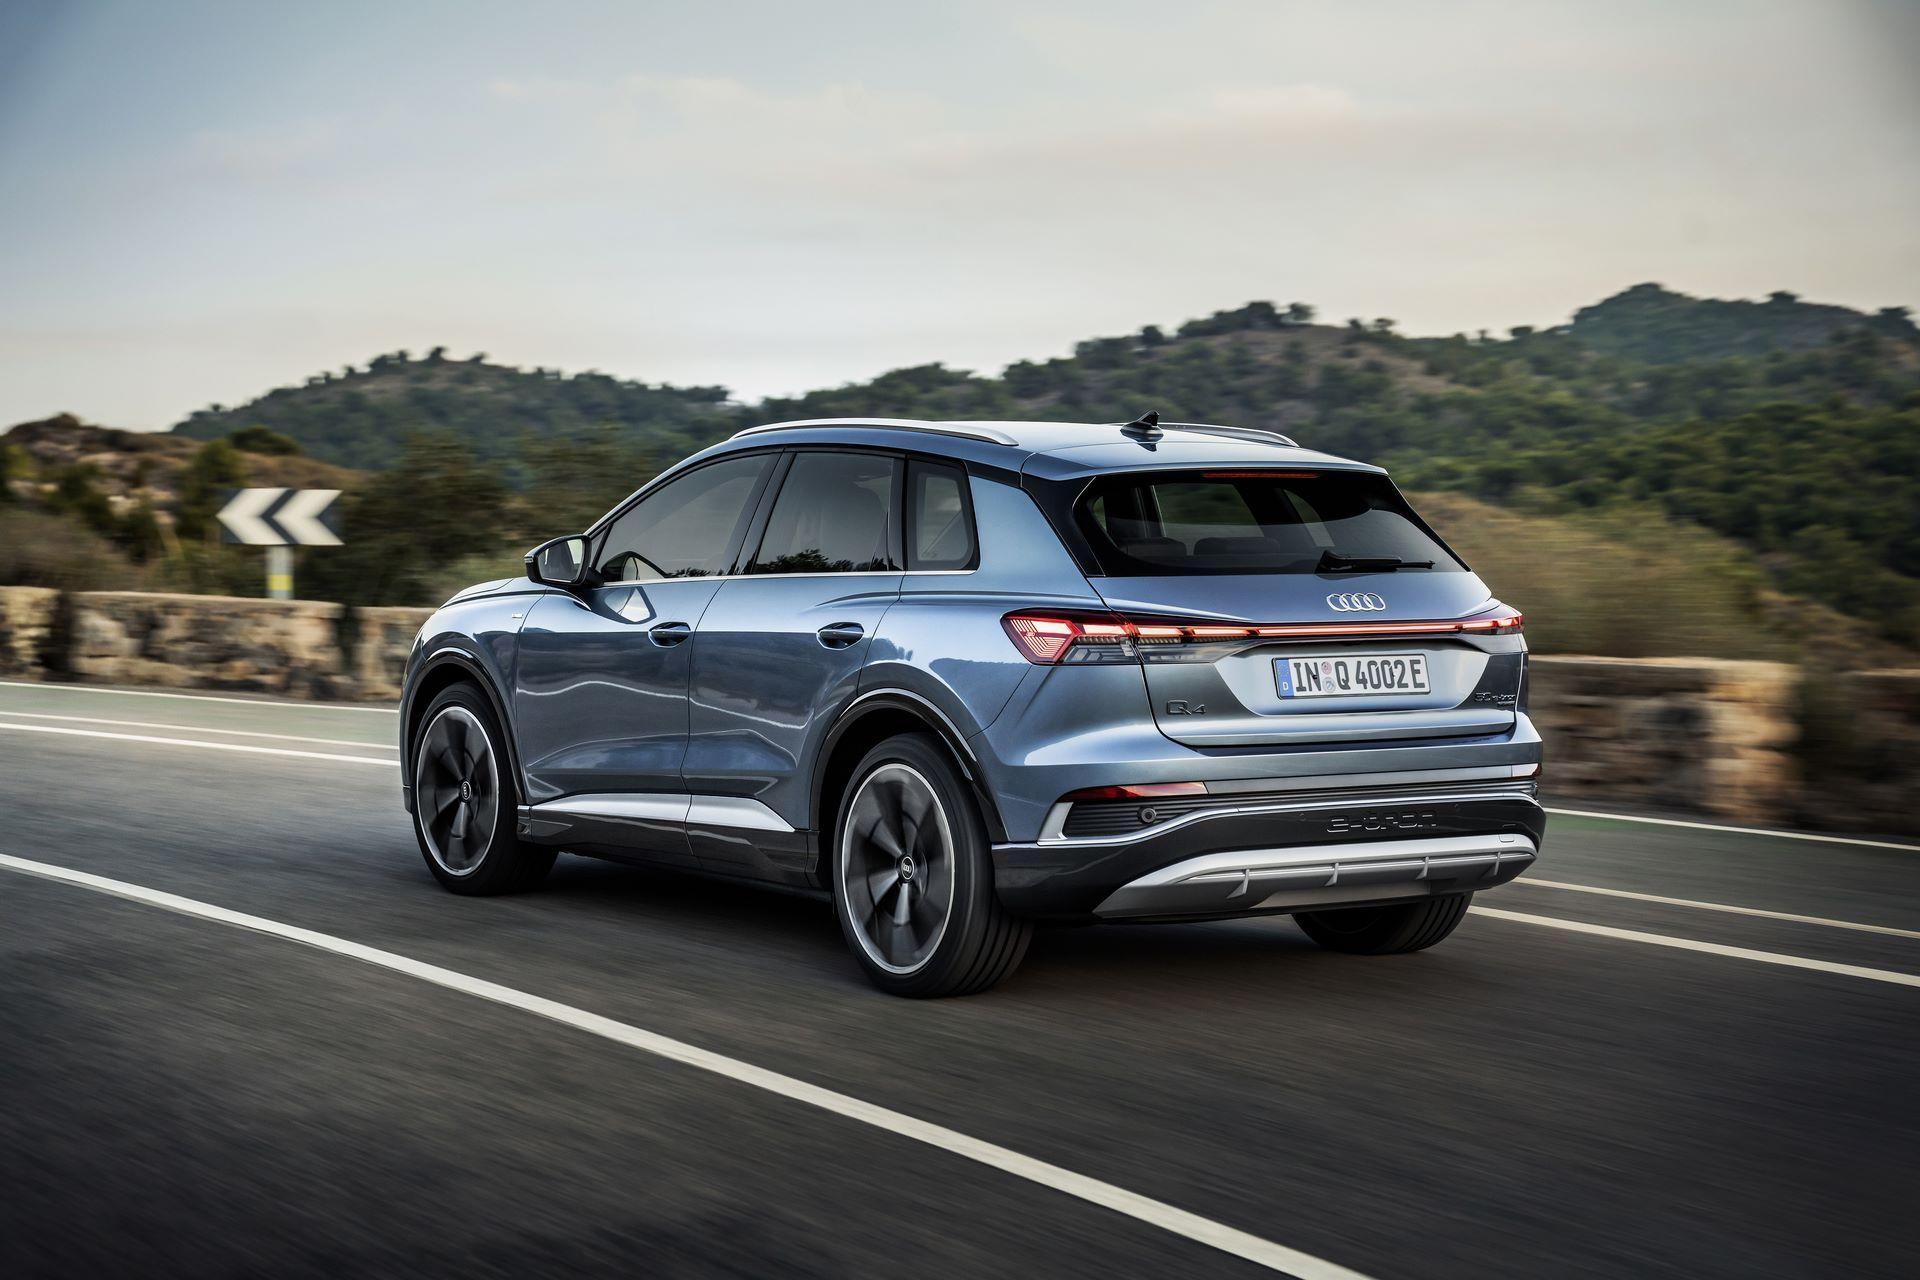 Audi-Q4-e-tron-and-Q4-e-tron-Sportback-57